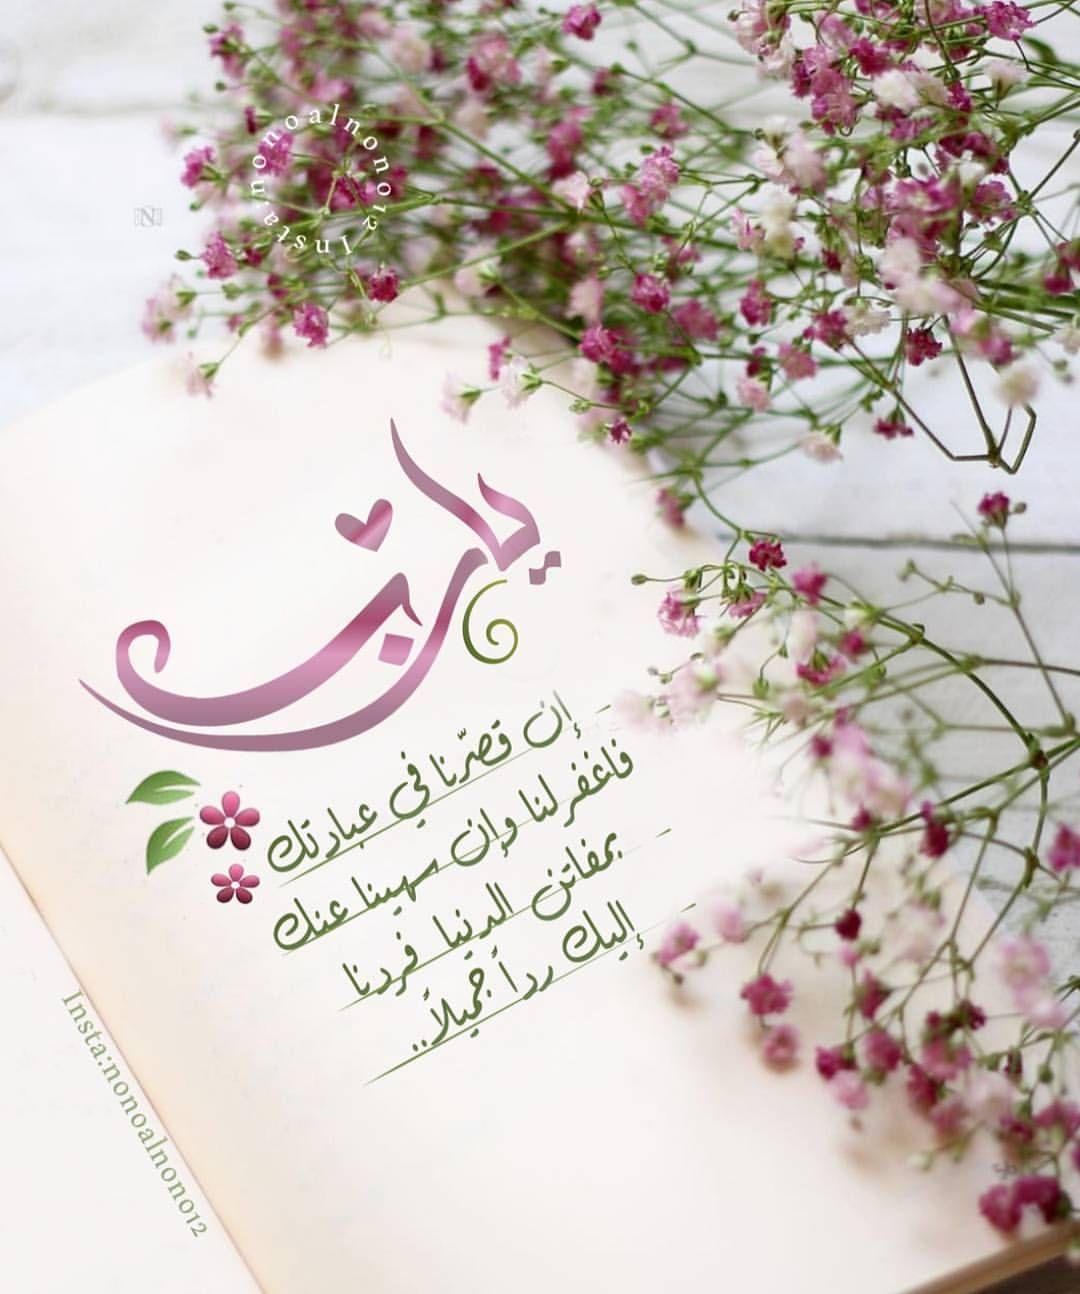 488 Likes 26 Comments Nonoalnono12 On Instagram اذا وجدت نفسك صامتا اذكر الله صباح الخيرصباحكم ر Islamic Wall Art Good Morning Arabic Islamic Prayer